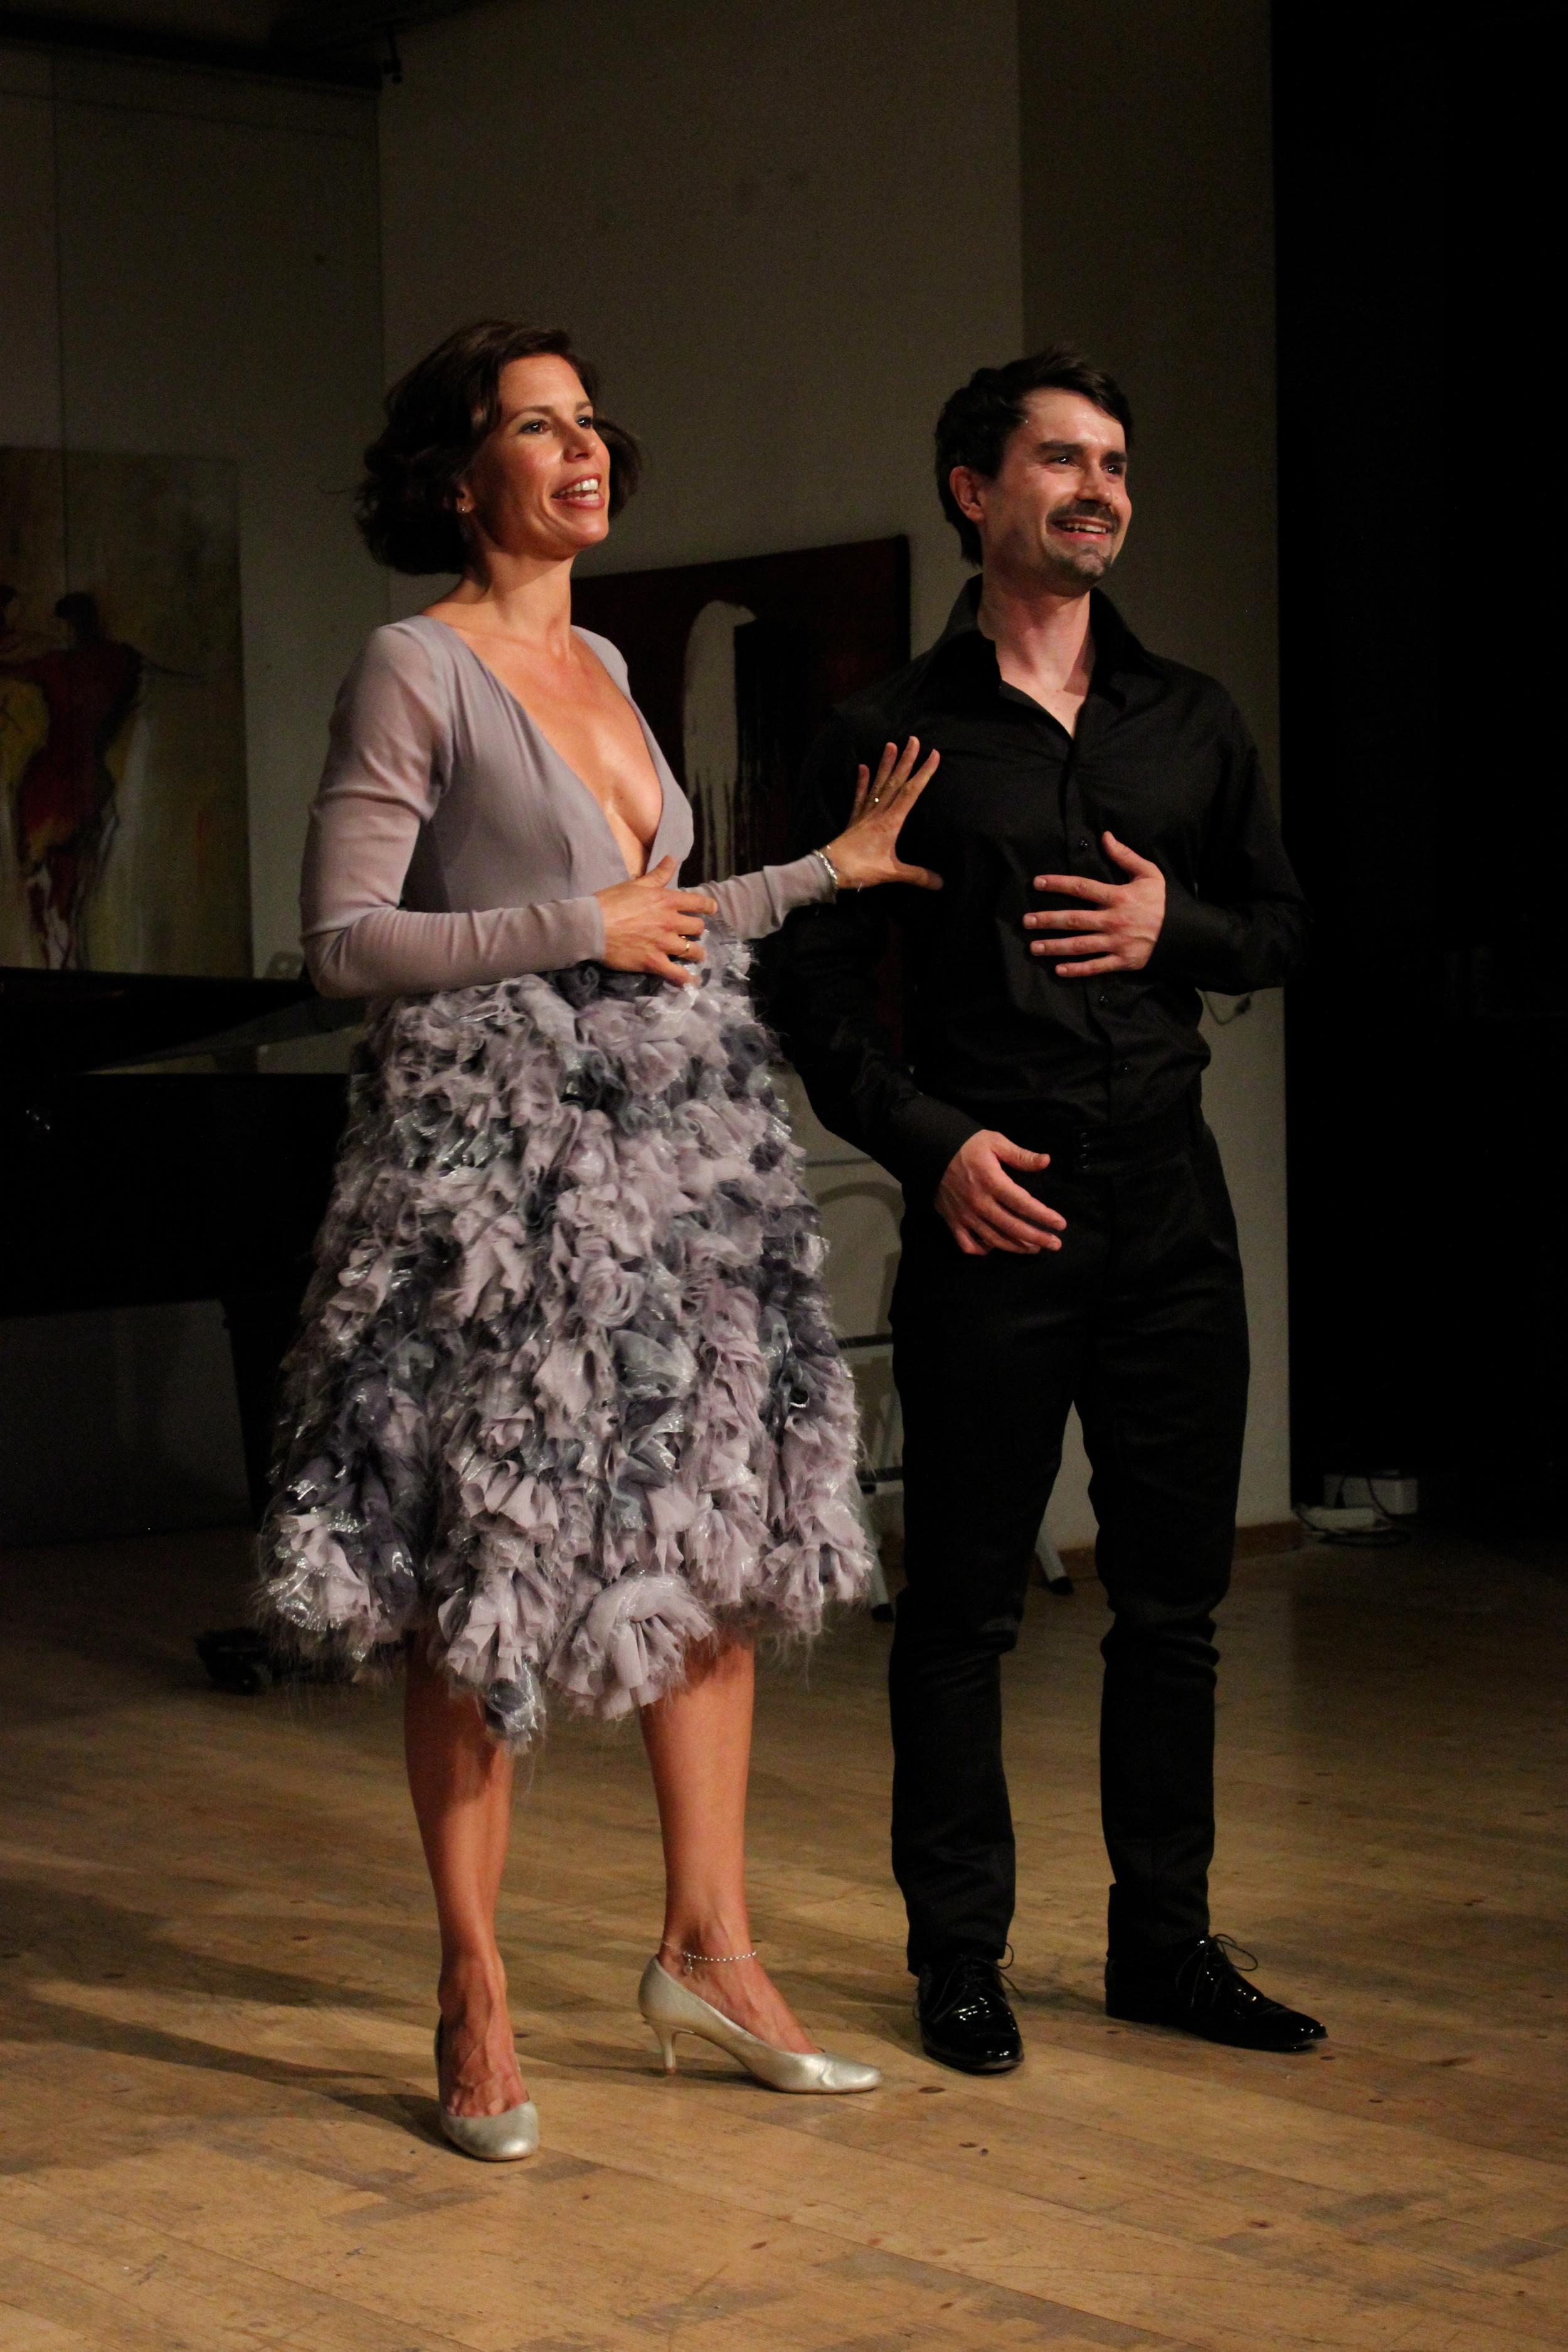 Julia Koci, soprano and Eric Stokloße, tenor